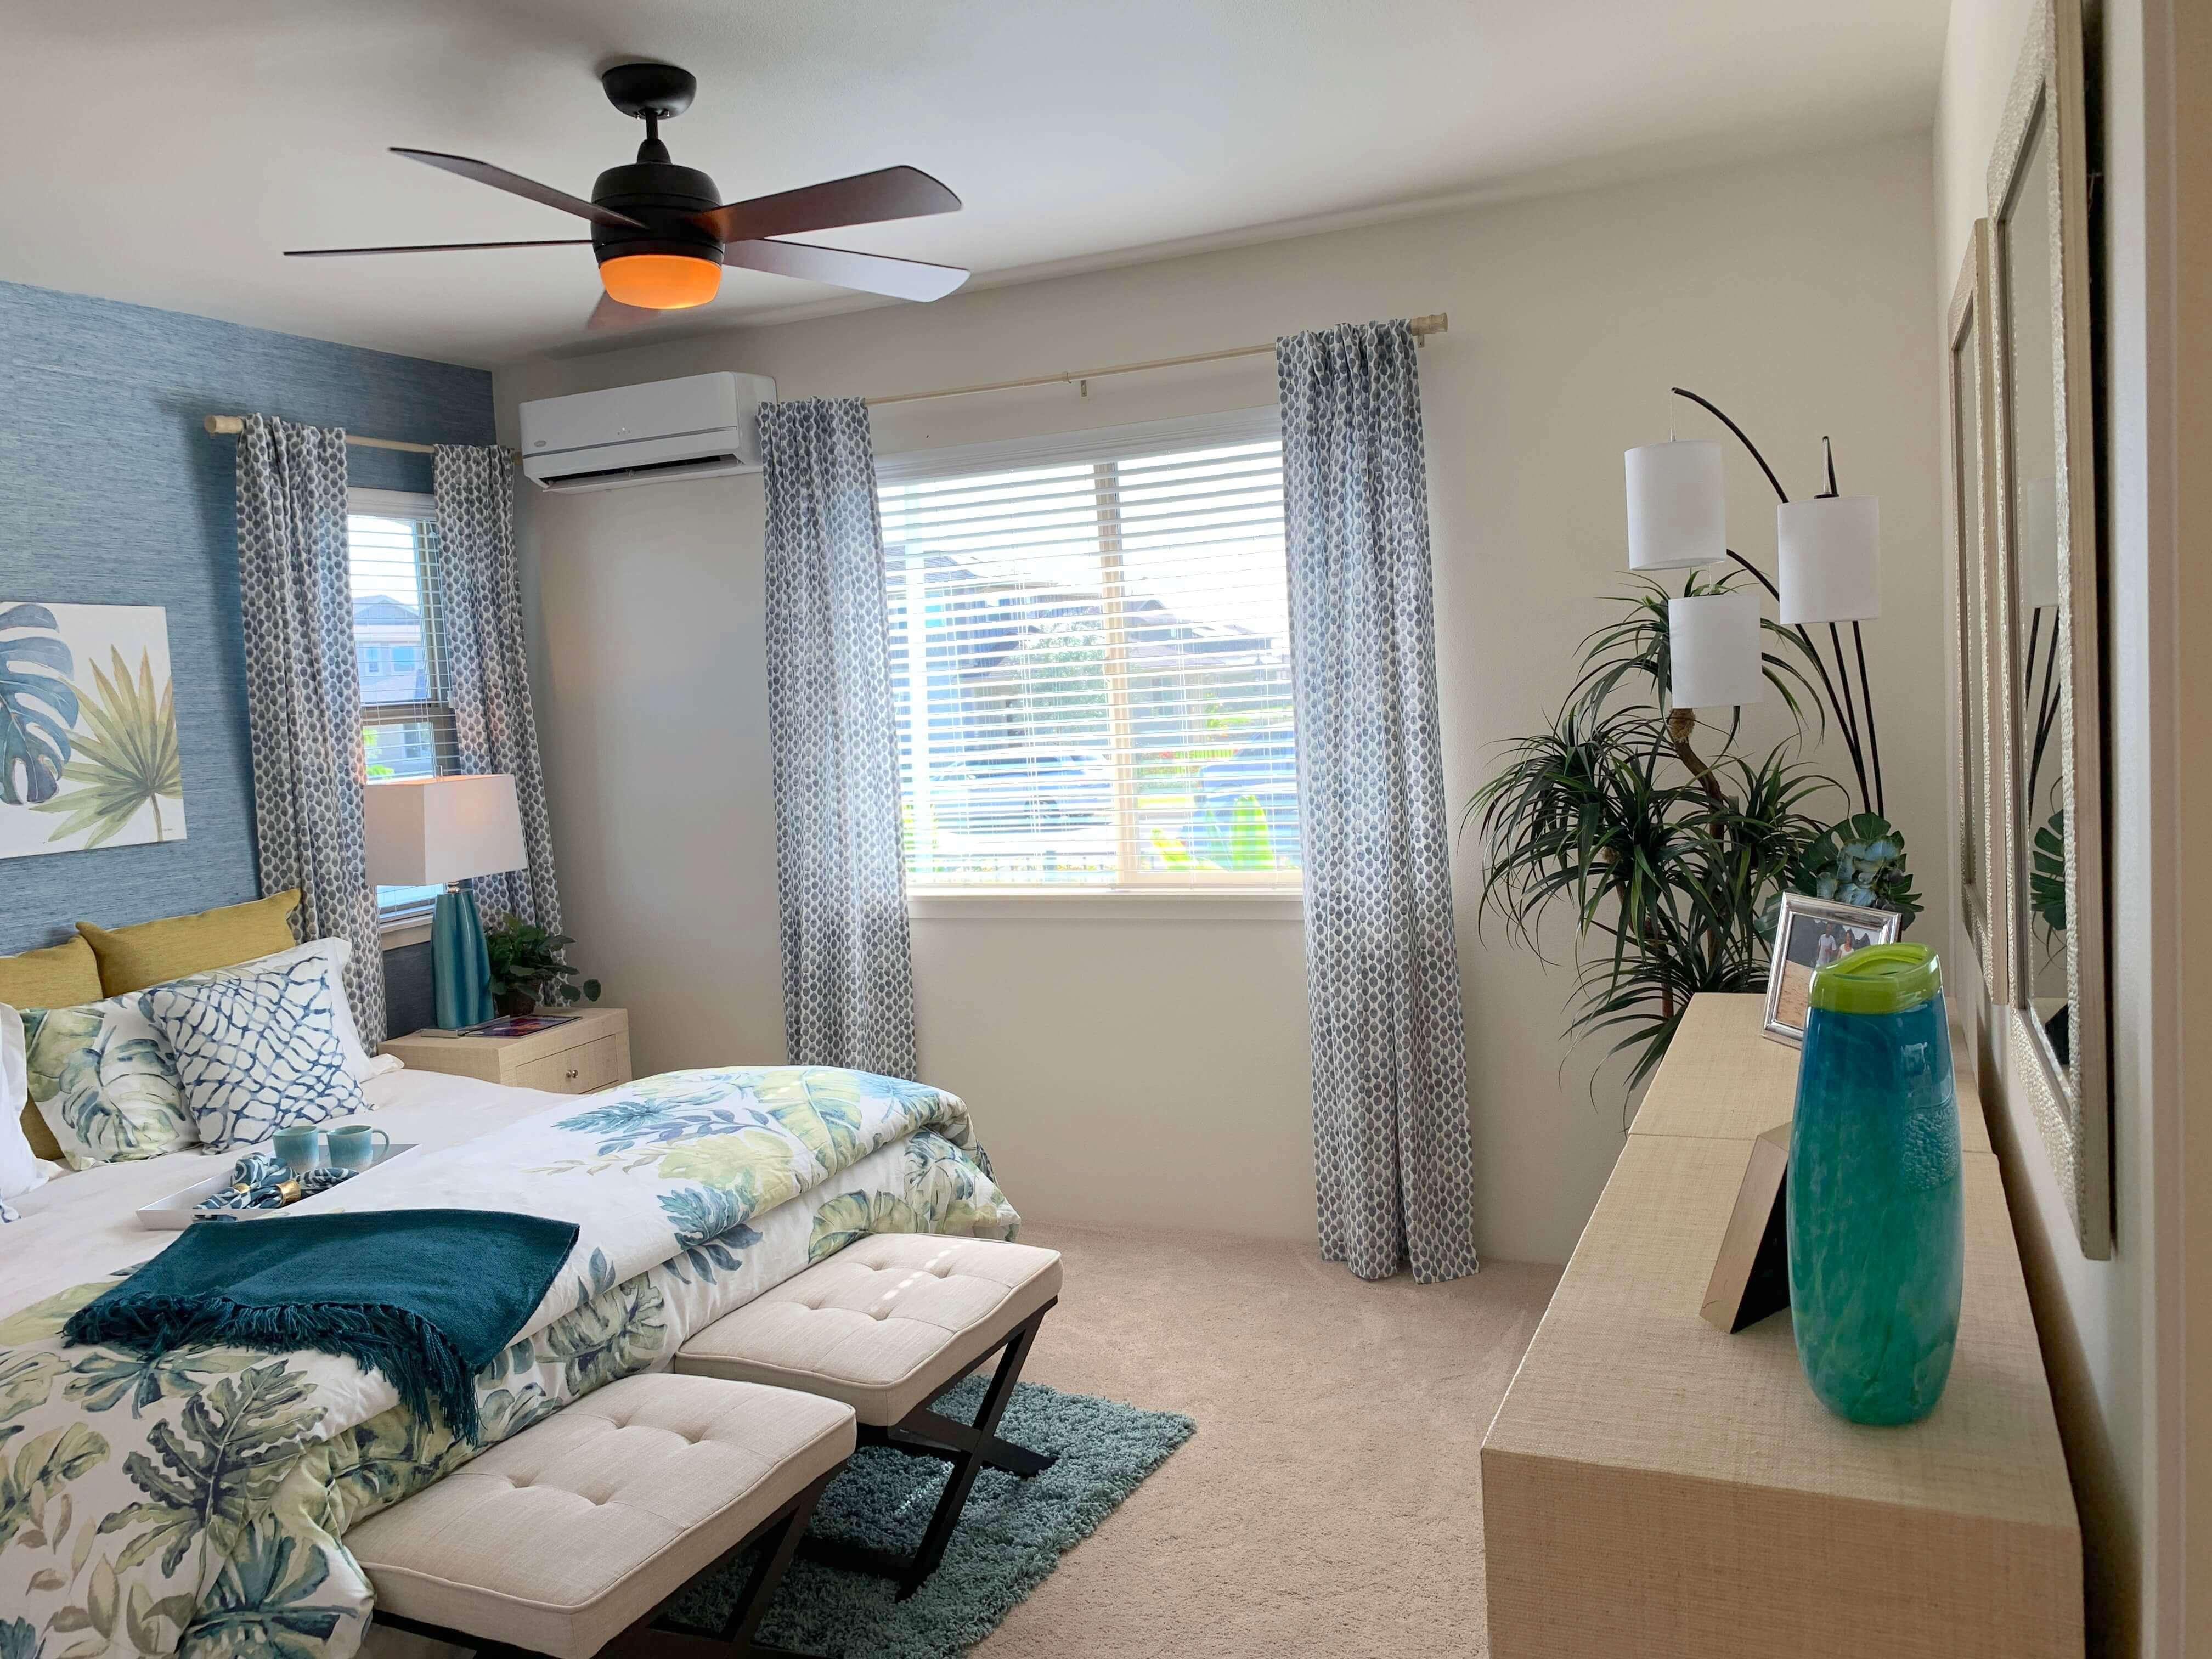 kohina at ho'opili master bedroom